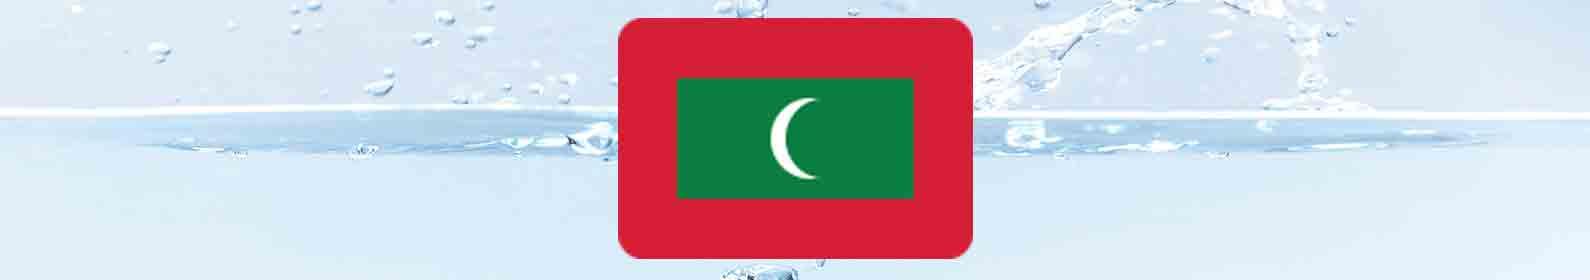 tratamento-de-agua-maldivas.jpg